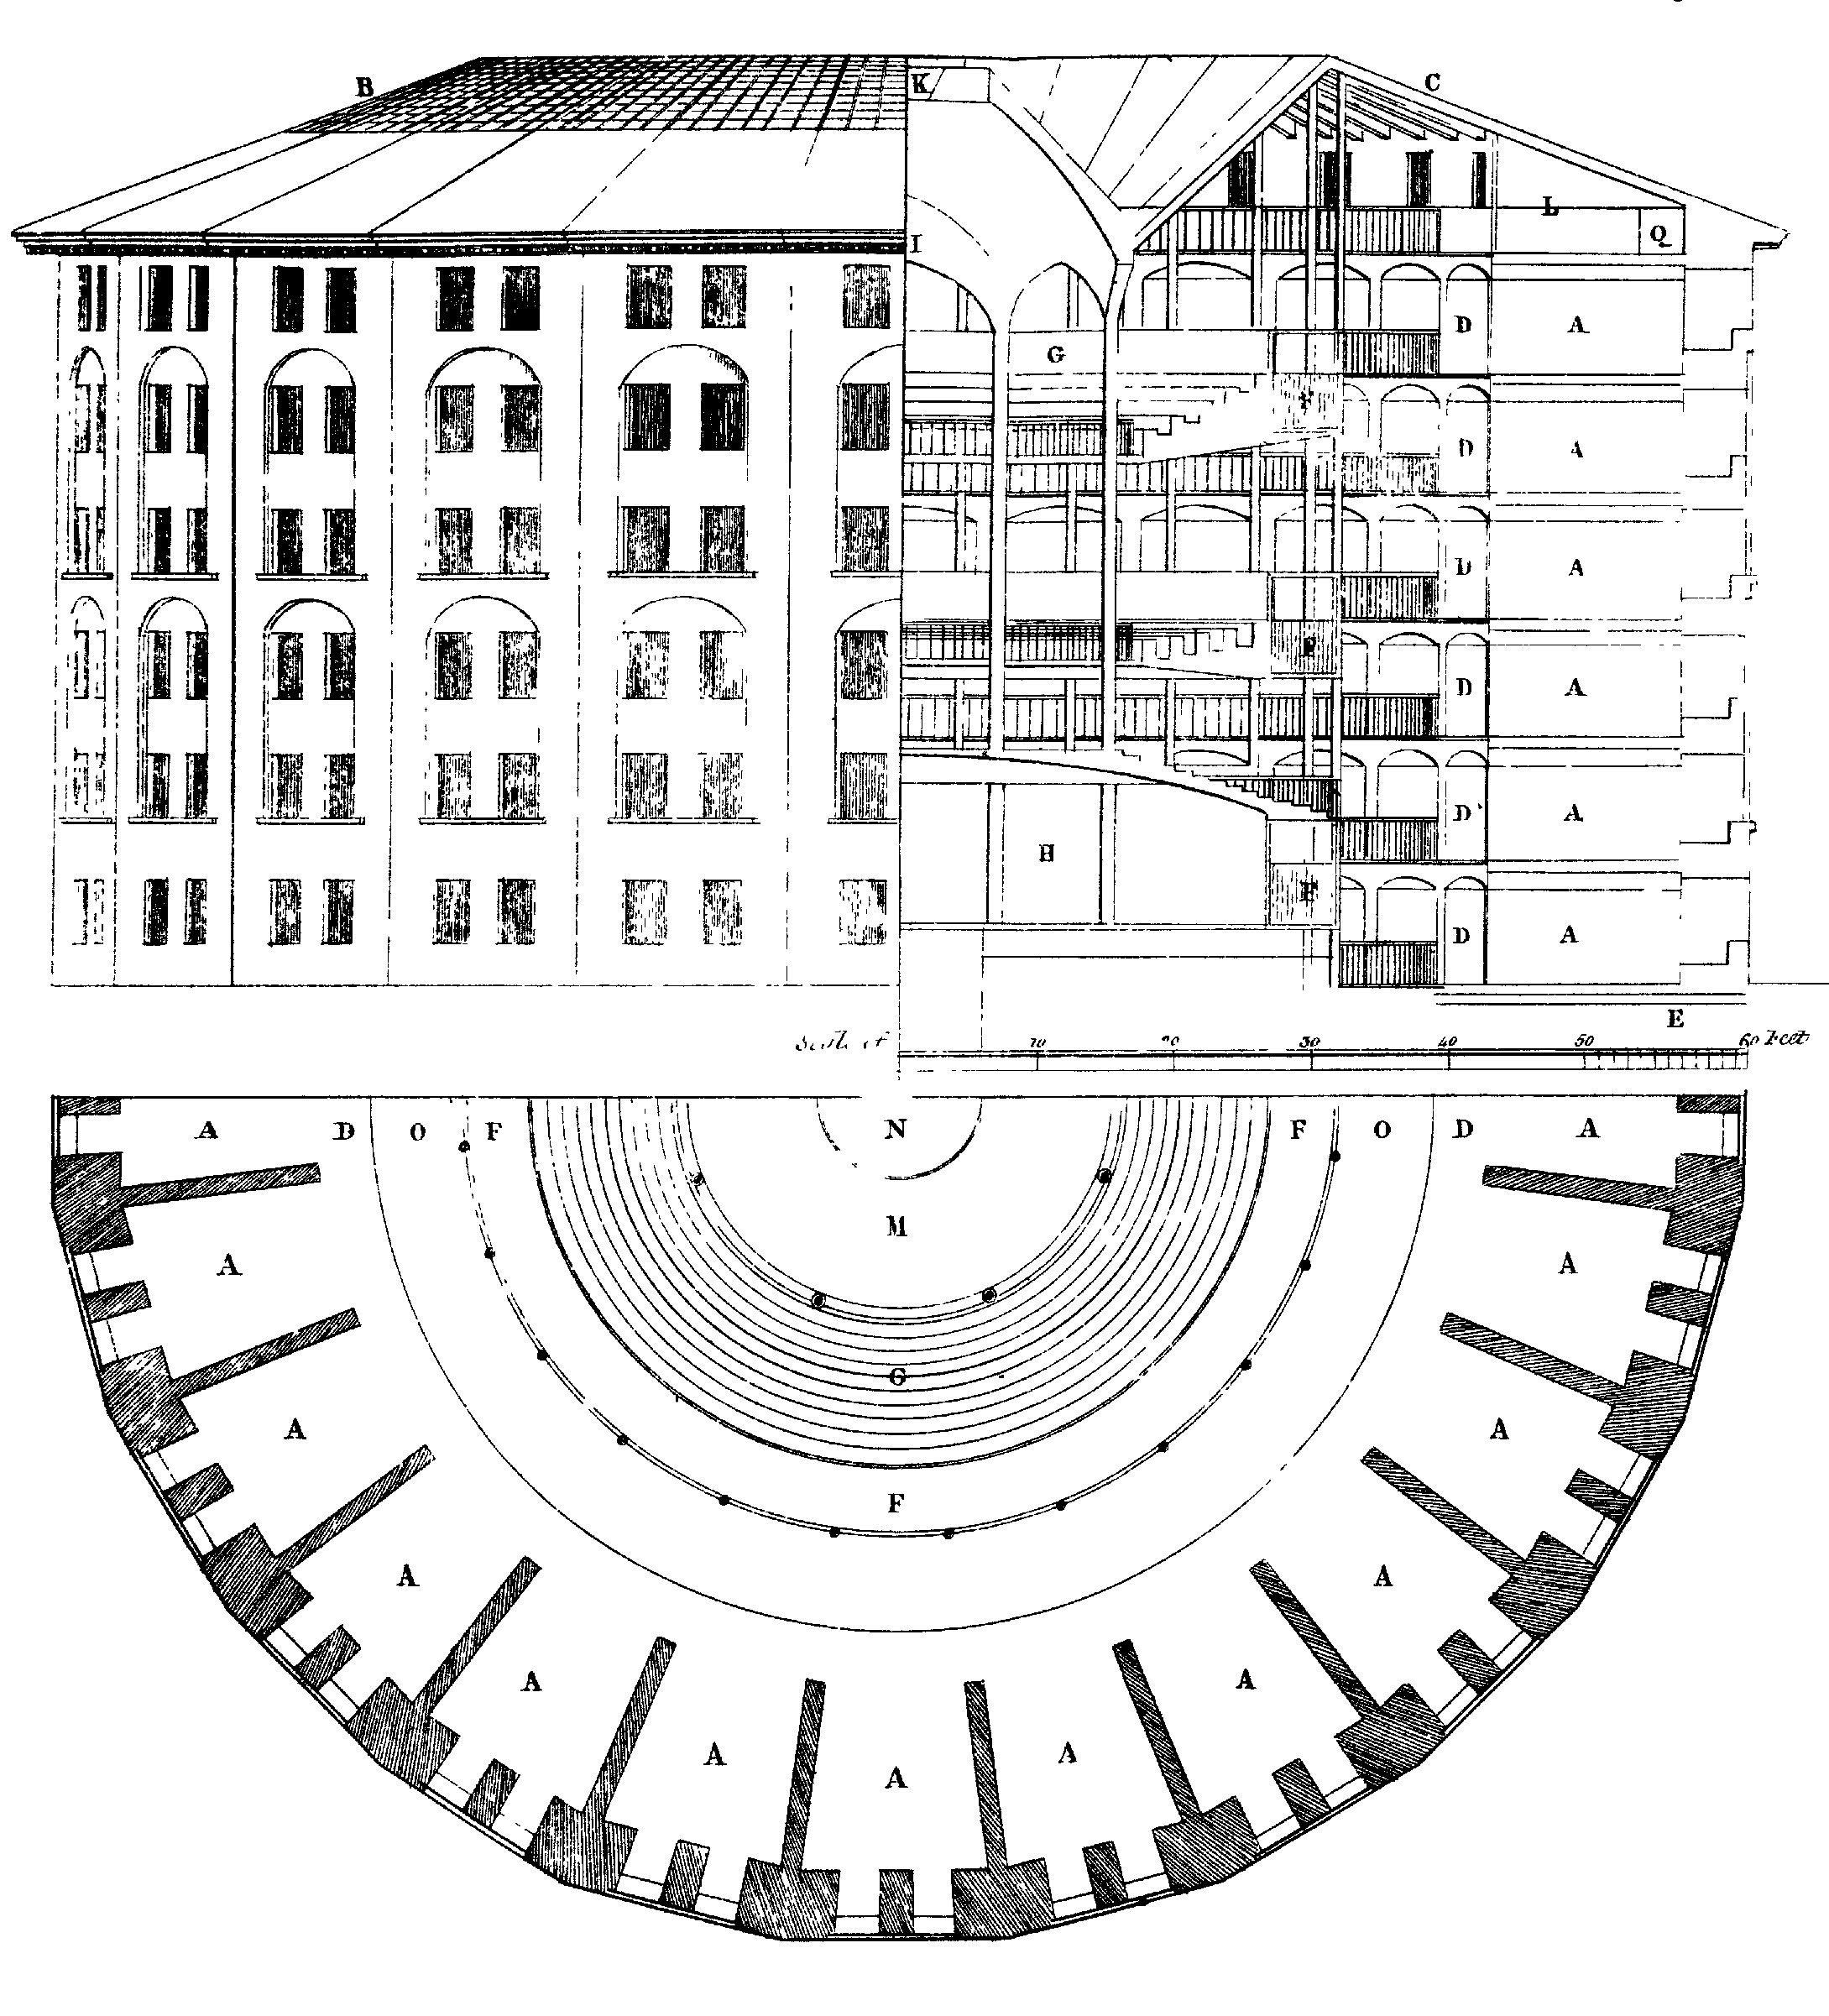 Par Jeremy Bentham — The works of Jeremy Bentham vol. IV, 172-3, Domaine public, https://commons.wikimedia.org/w/index.php?curid=3130497